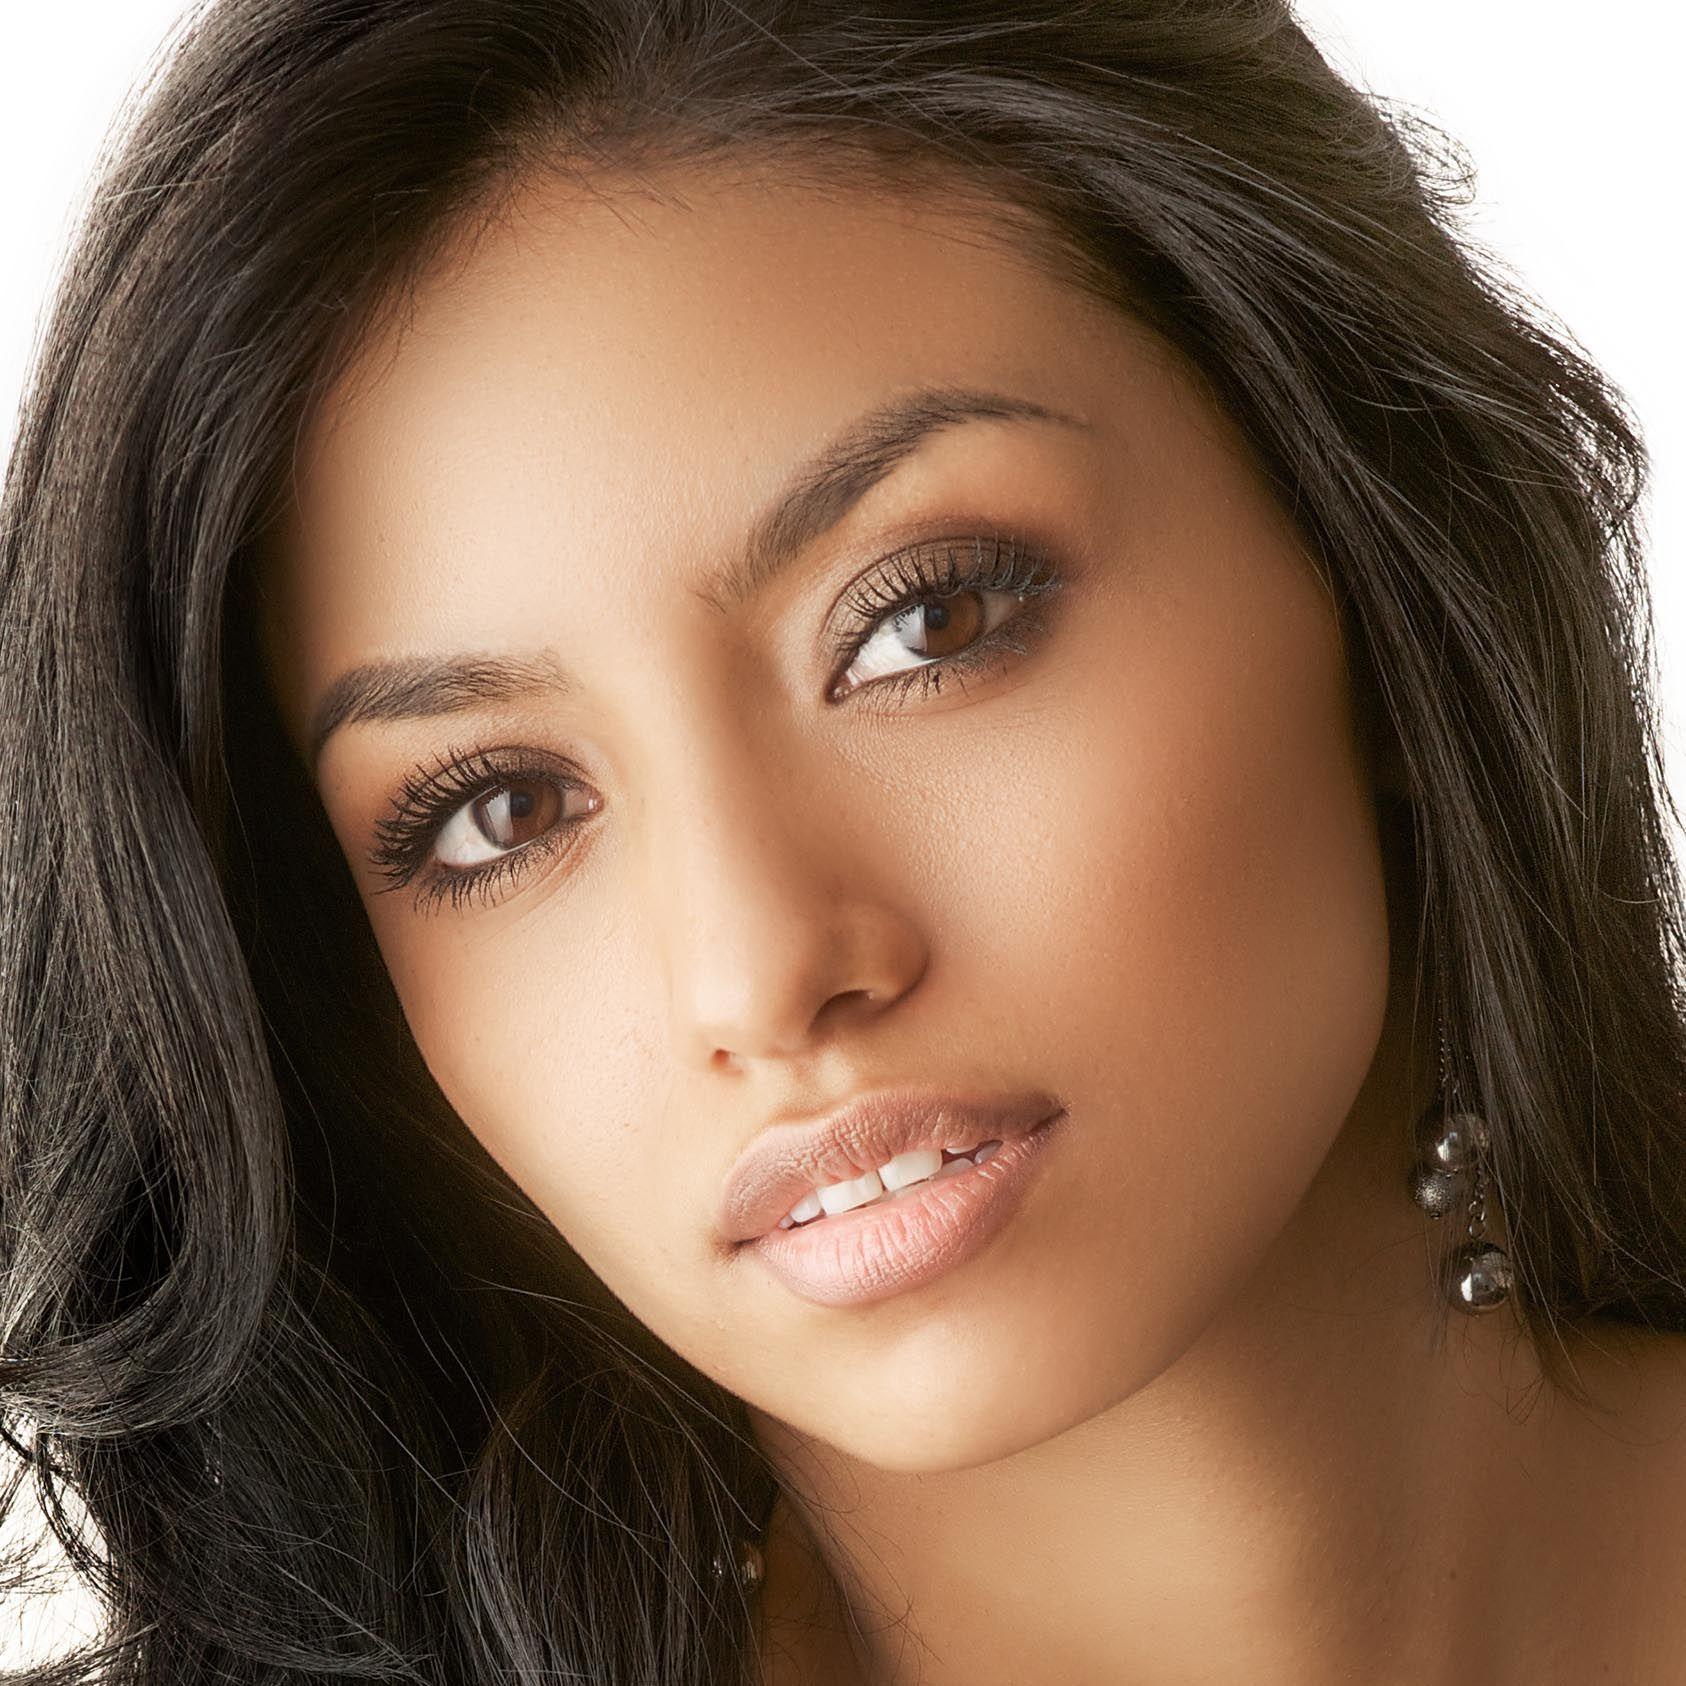 Legend Airbrush System Rose Gold & Black Airbrush makeup